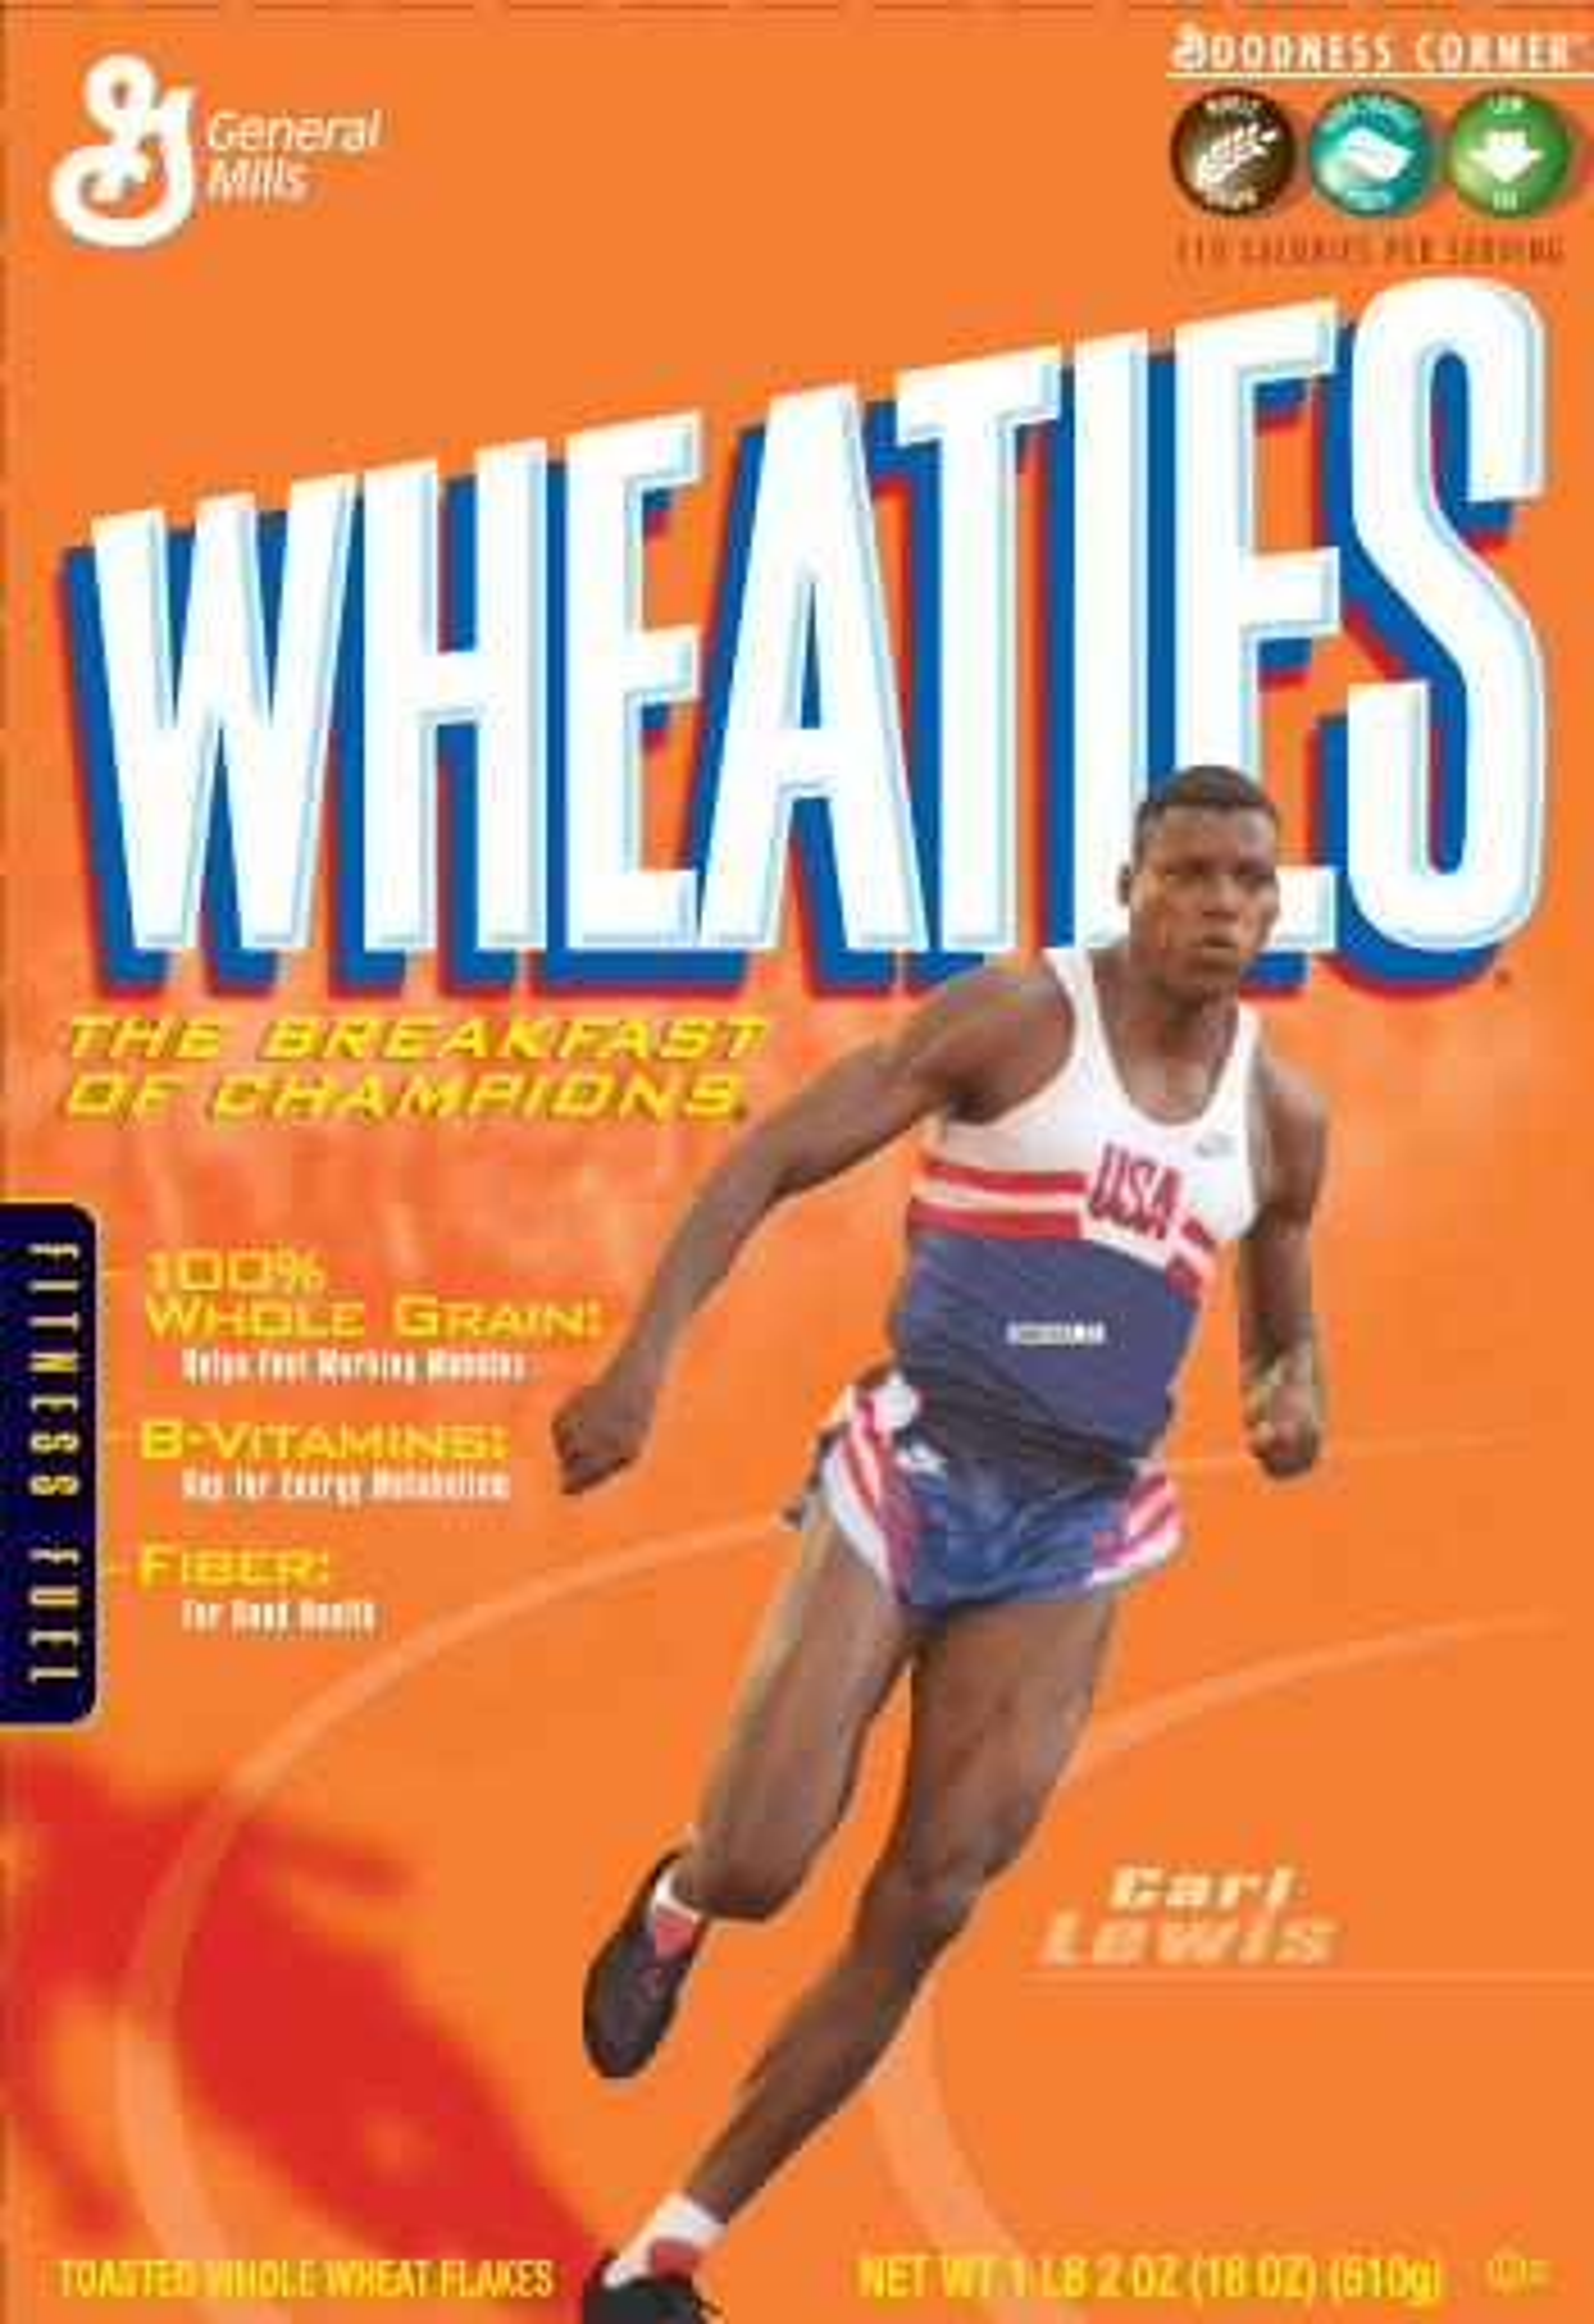 Carl Lewis on the Wheaties box.